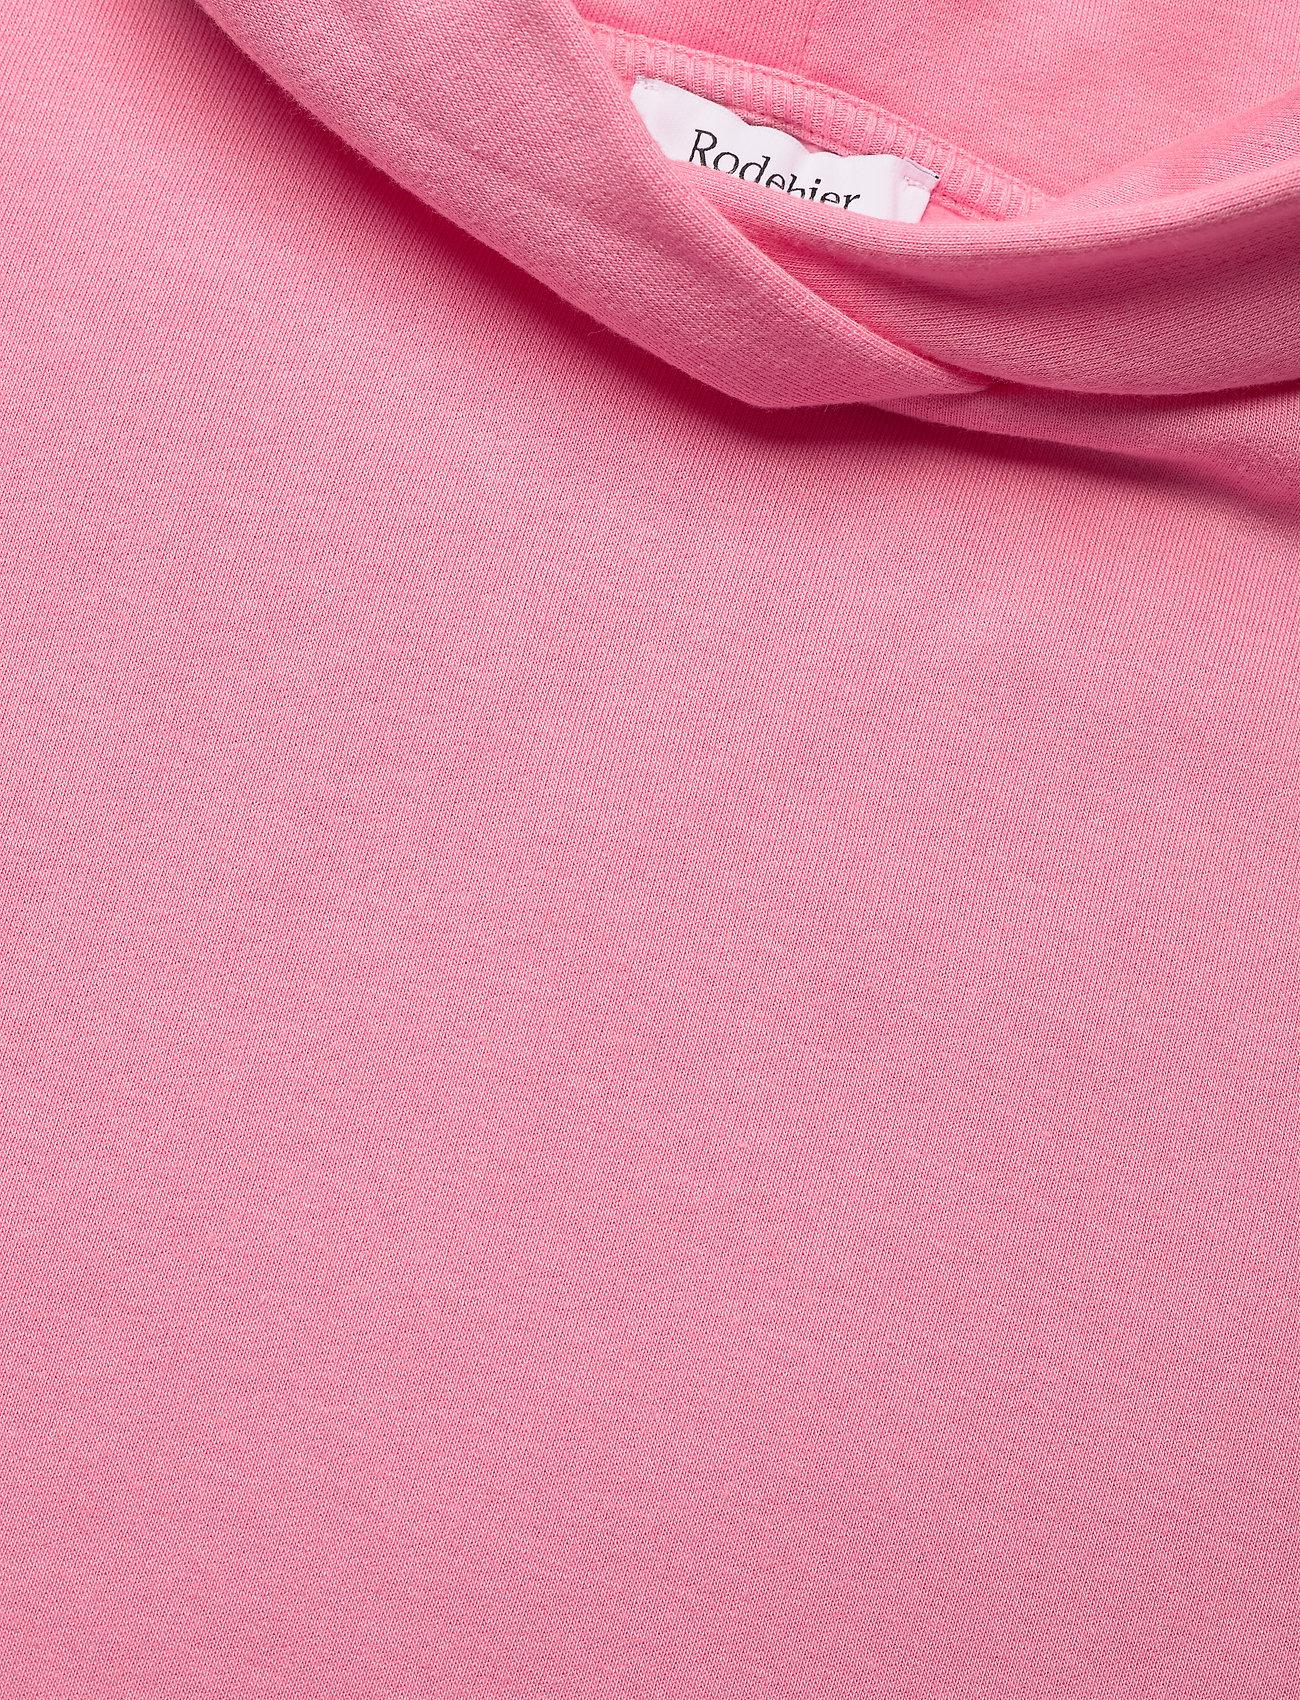 RODEBJER - RODEBJER MONOGRAM - sweatshirts & hættetrøjer - cherry blossom - 2